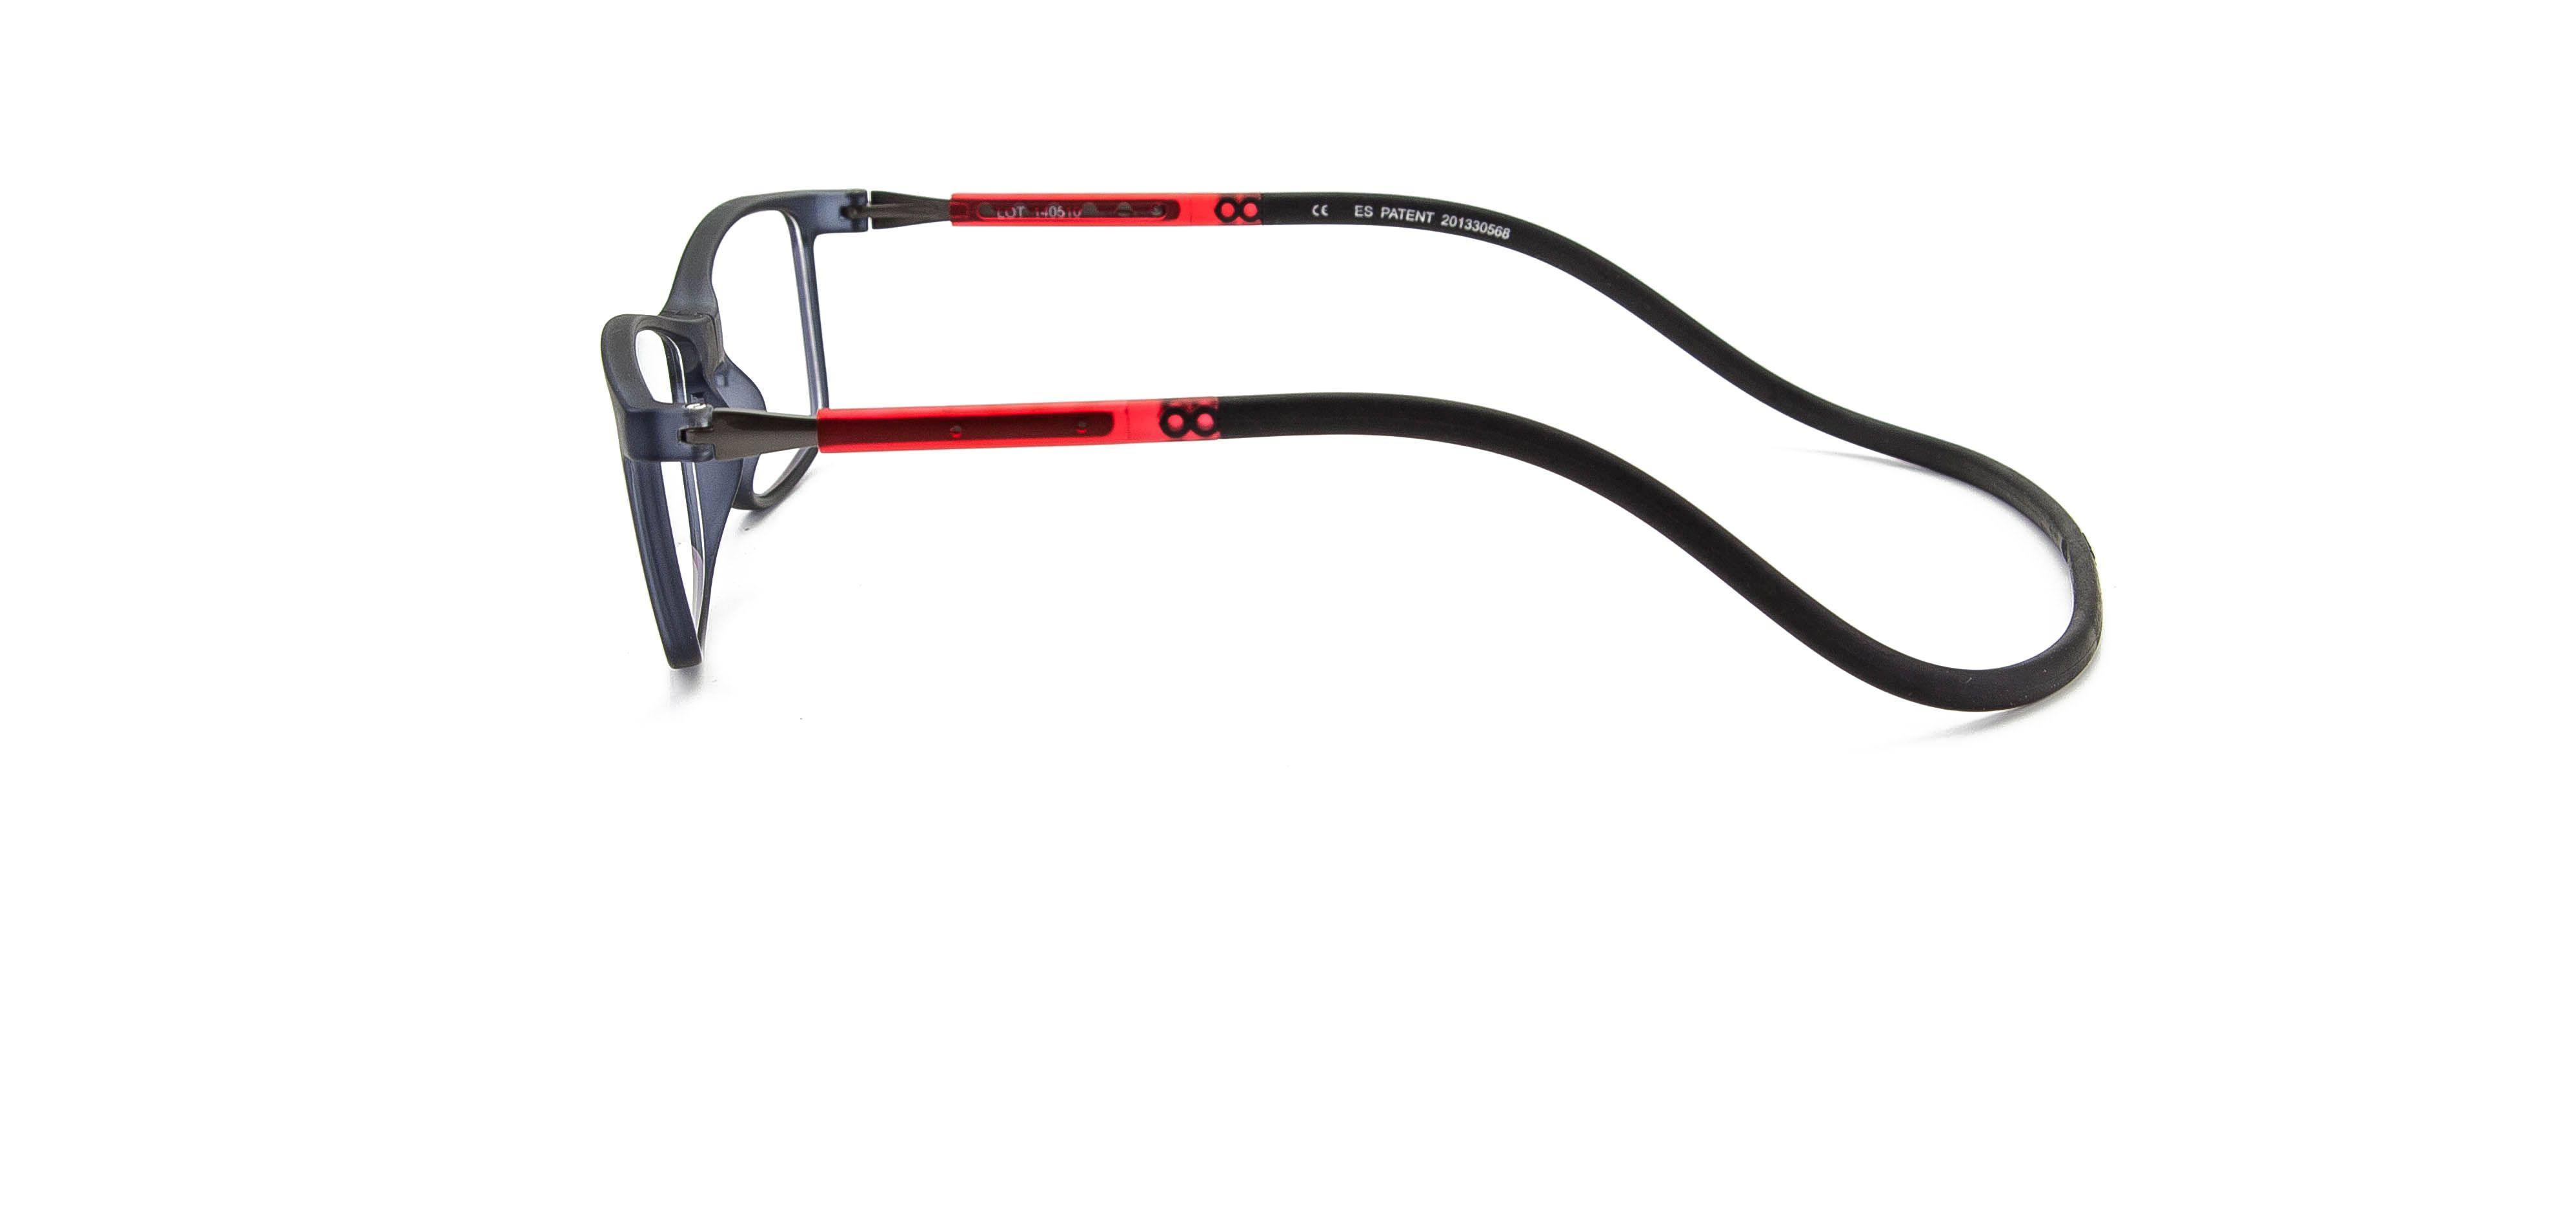 Montura para gafas graduadas, con conexión frontal magnética y varilla única ajustable-flexible-elastomérica. Lentes BLUE LIGHT. #slastik #barcelona #beceene #bereader; #eyewearbarcelona #gafalectura #graduado #magnetic #plegable #presbicia #antibluelight